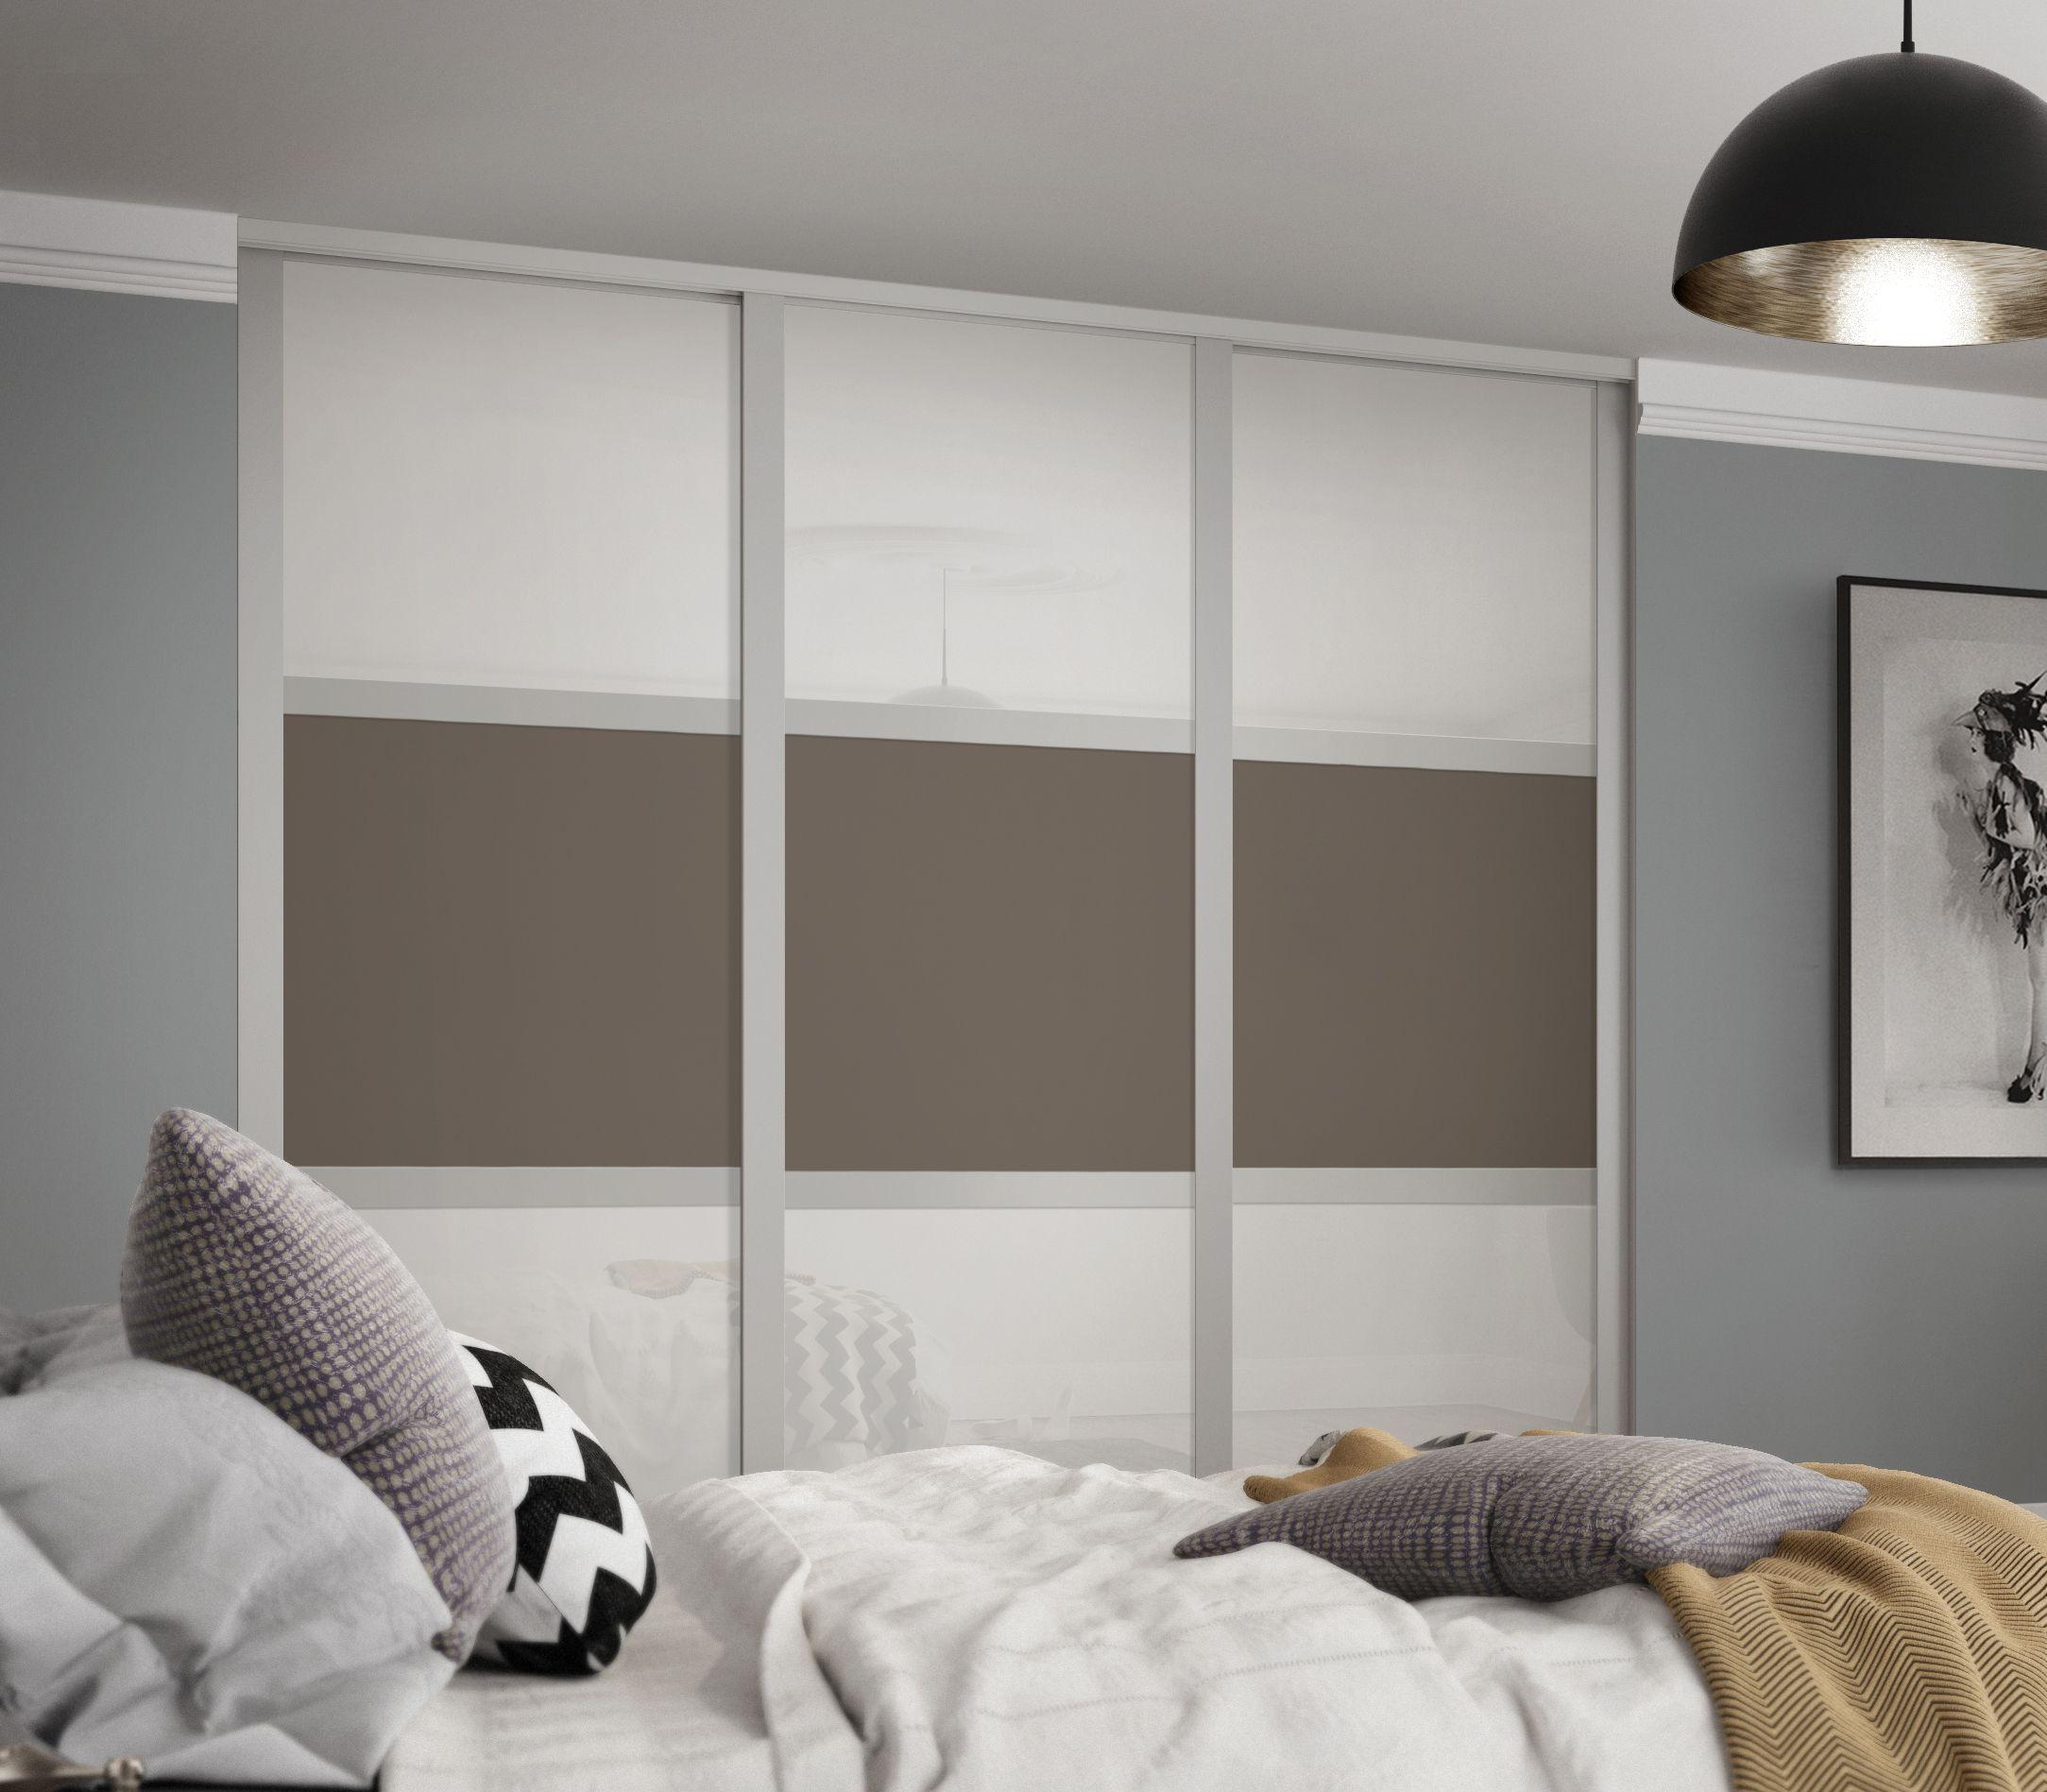 3 panel mirrored sliding closet doors - Deluxe Shaker 3 Panel Sliding Wardrobe Doors In Arctic White Stone Grey With Cashmere Frame